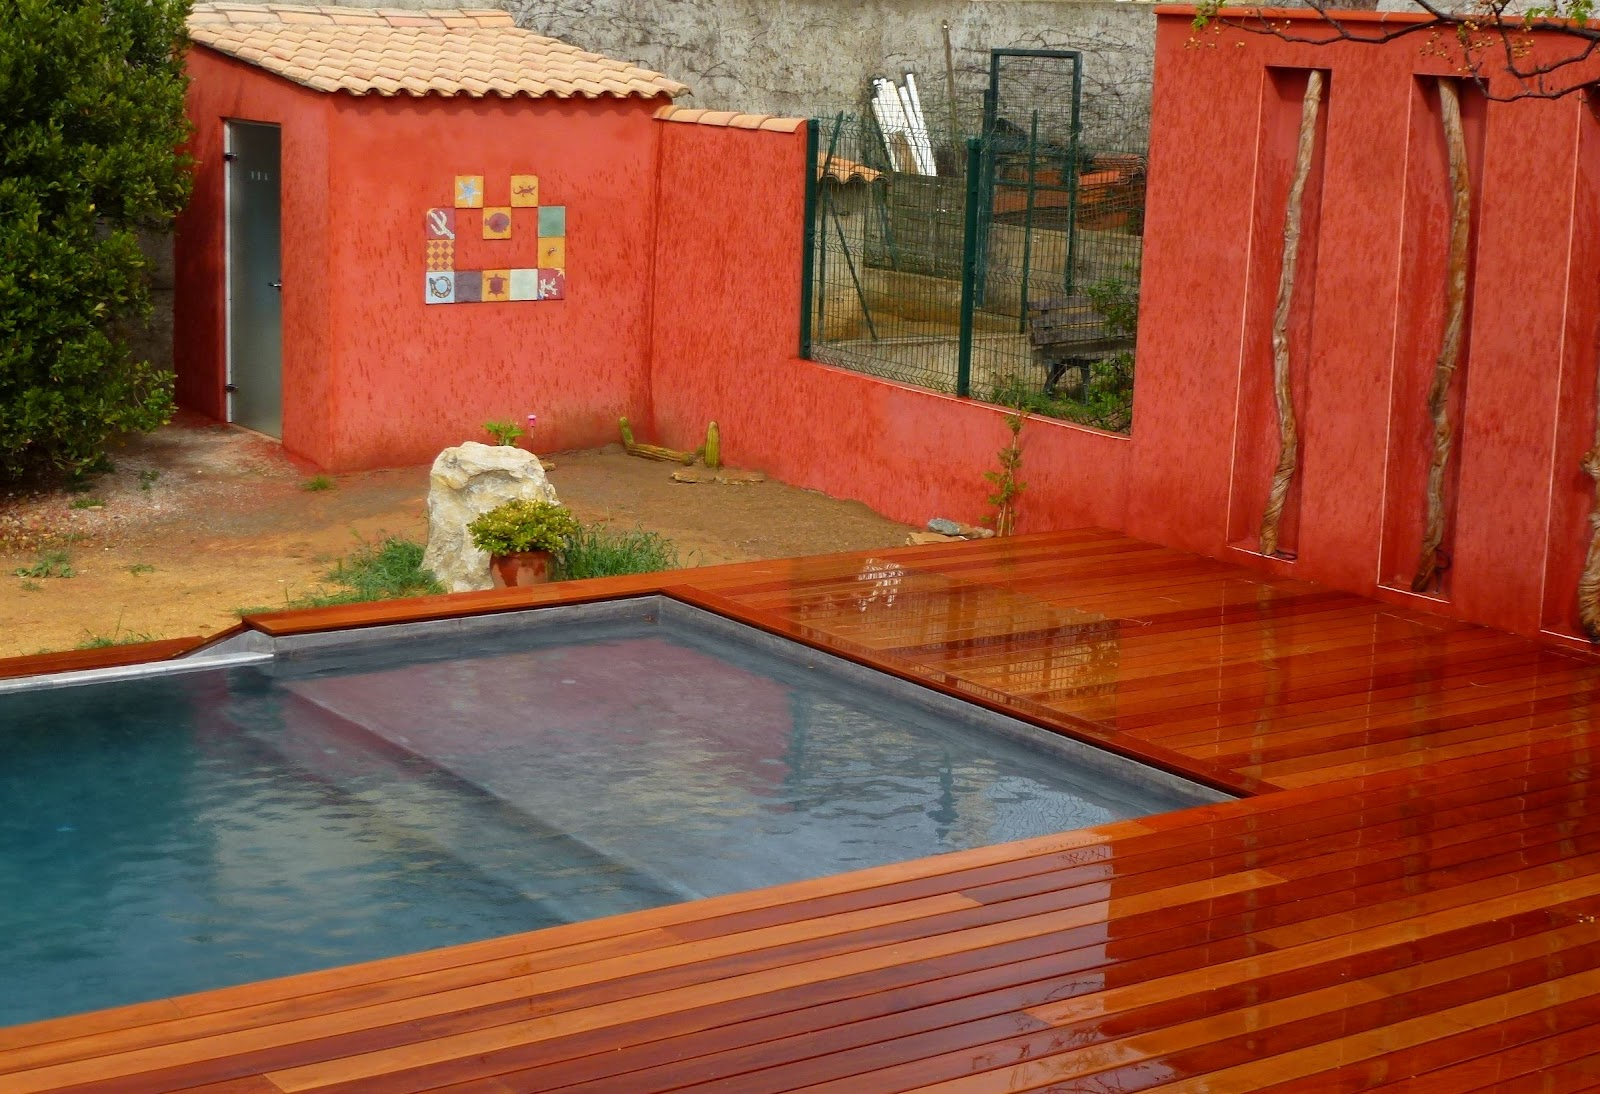 Finitions piscine construction piscine diffazur for Construction piscine diffazur